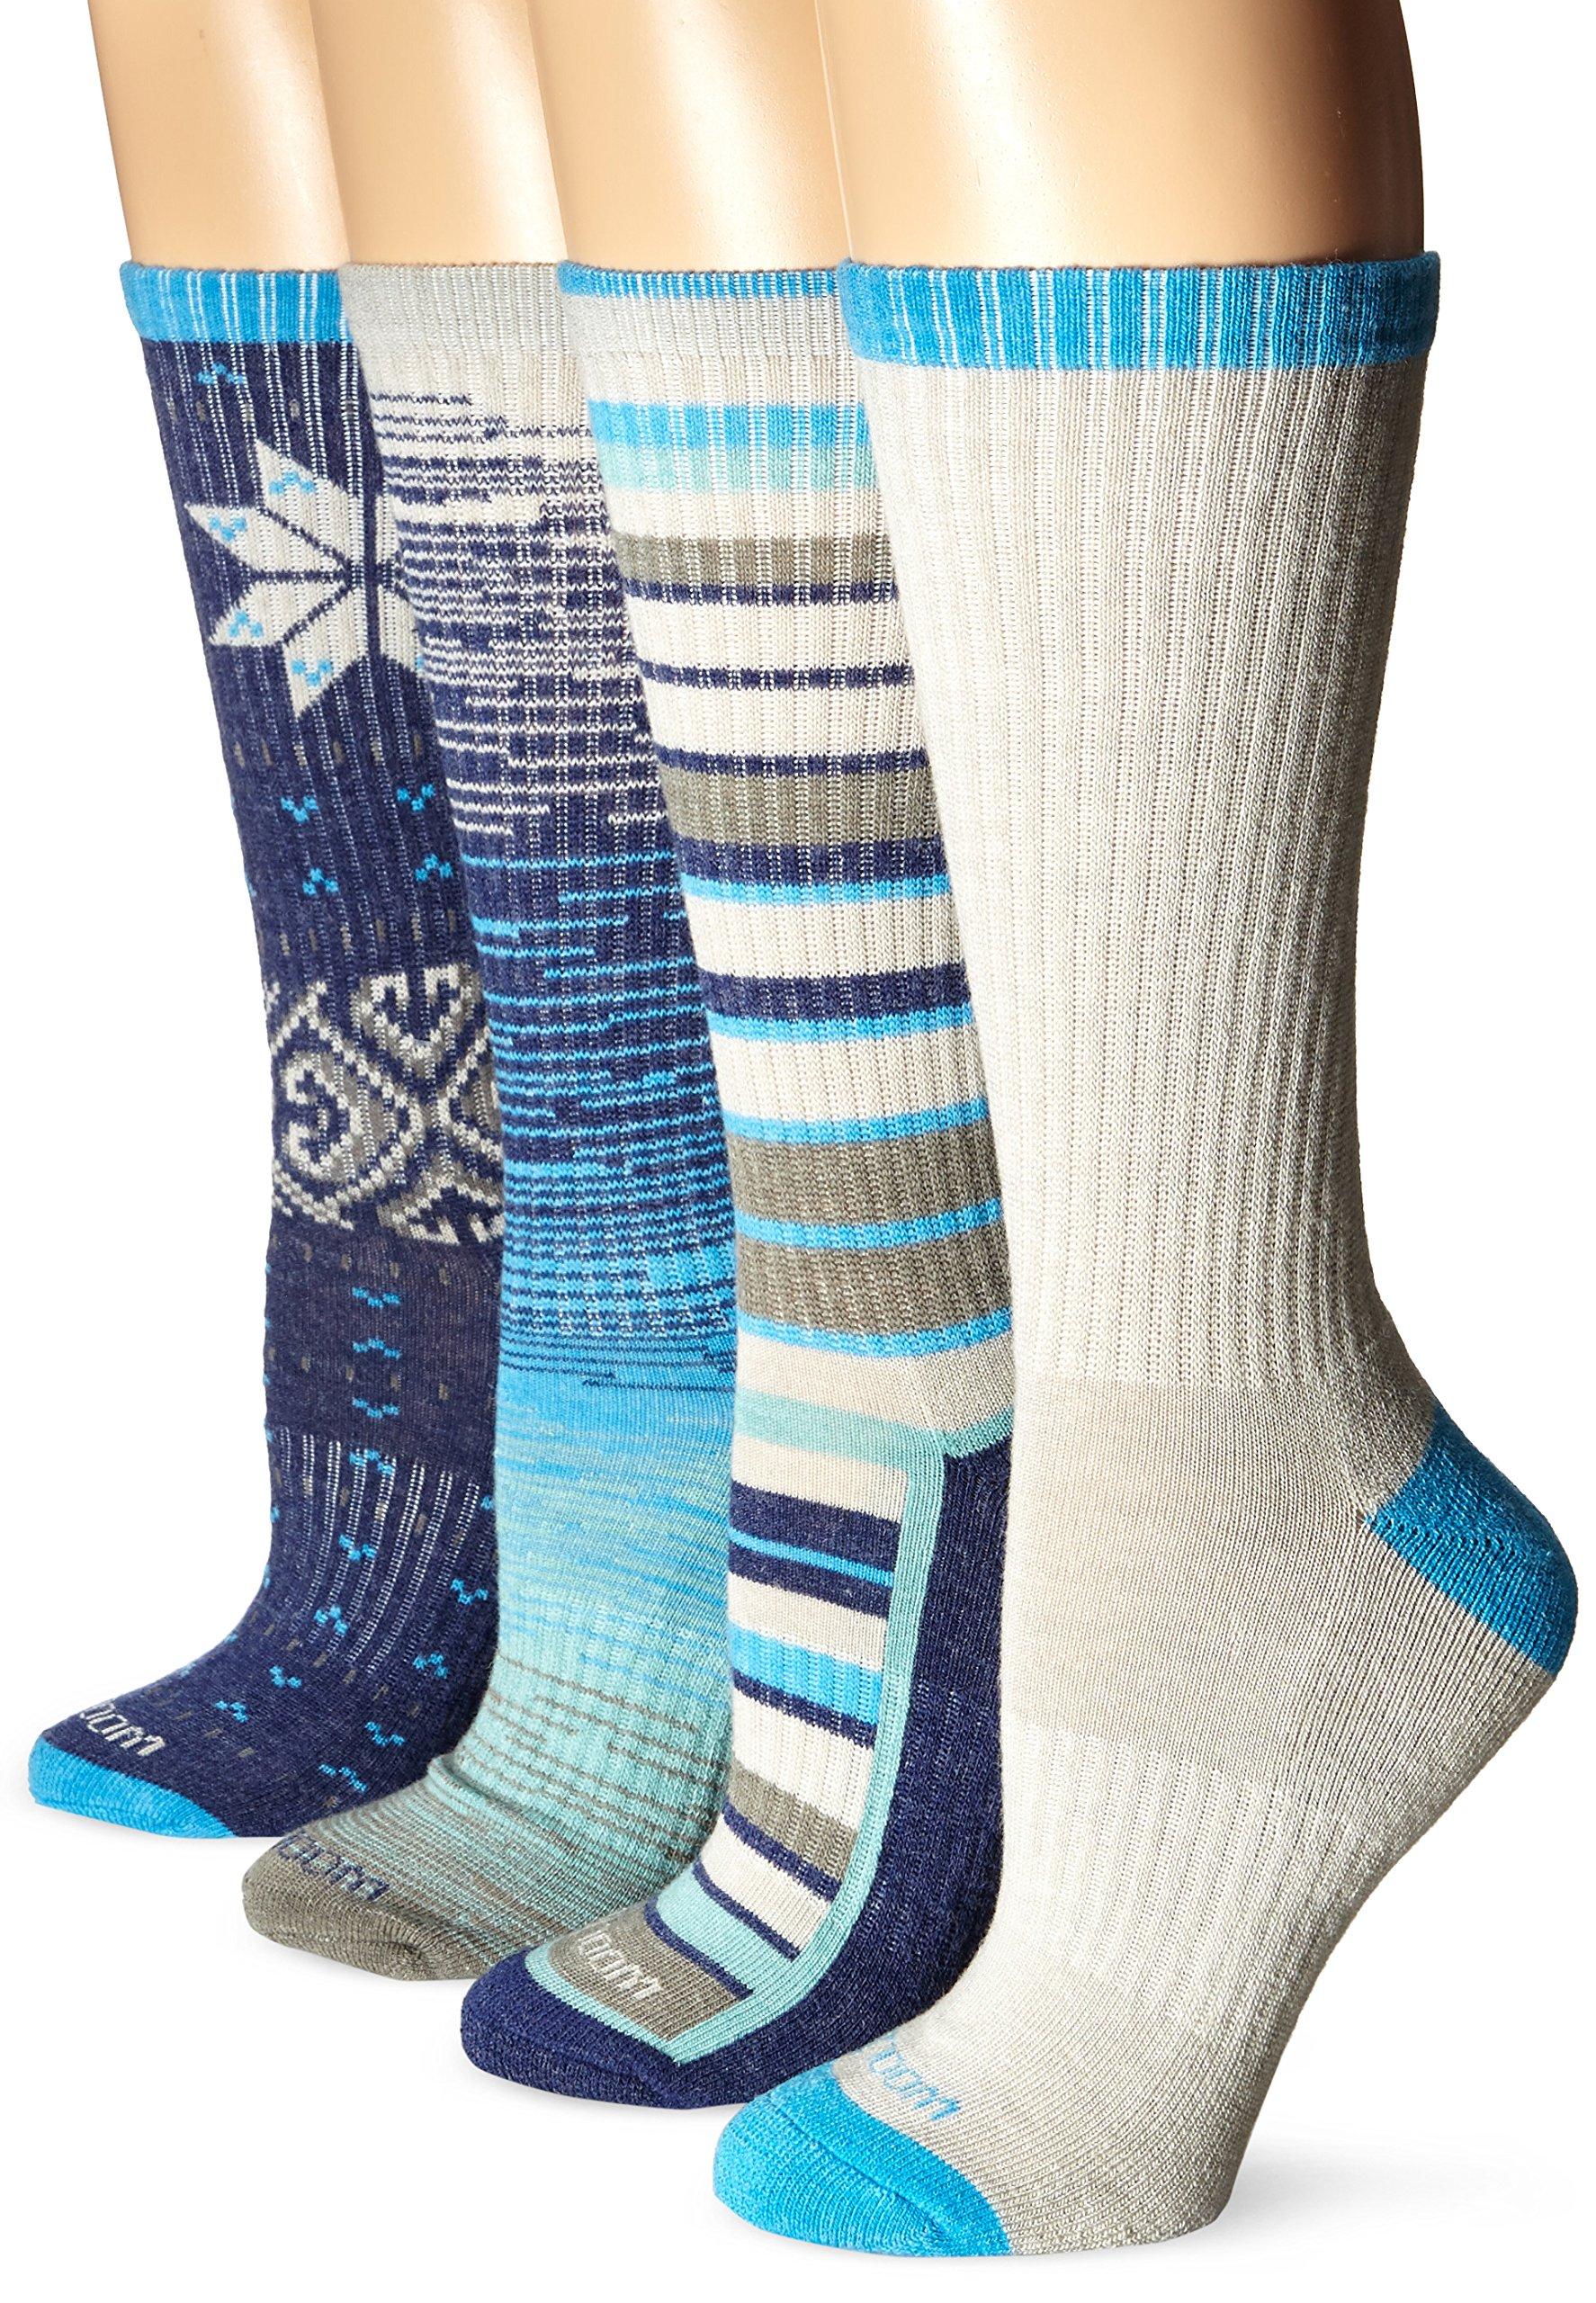 Wool IQ Women's Merino Wool Trail Crew Sock 4-pack, Blue/Teal Multi, 9-11